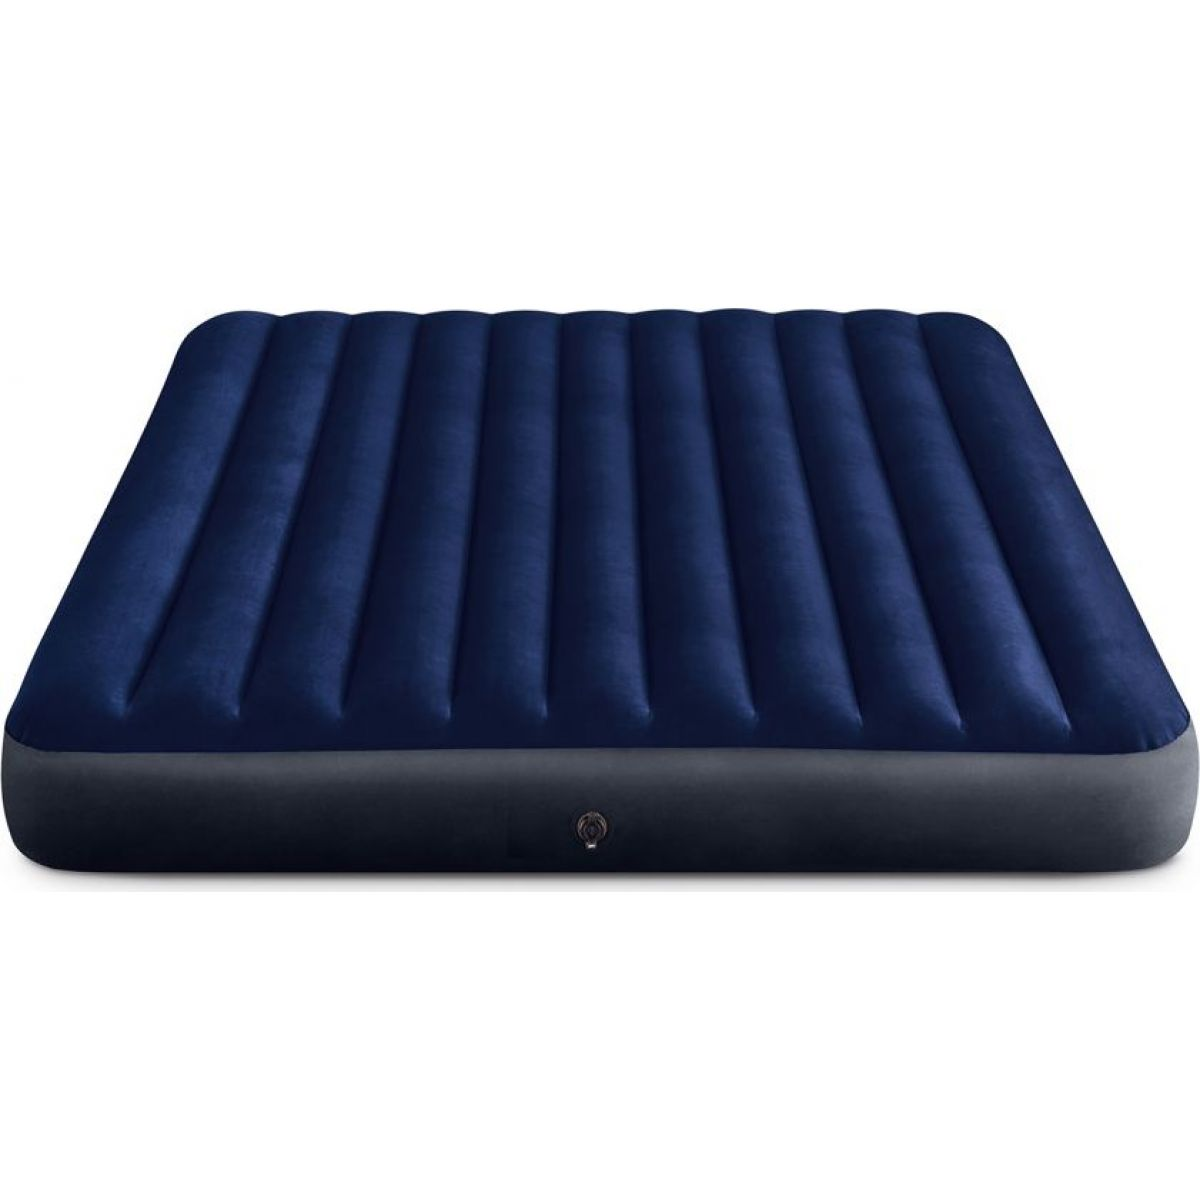 Intex 64755 Nafukovací postel Standard King 183 x 203 cm